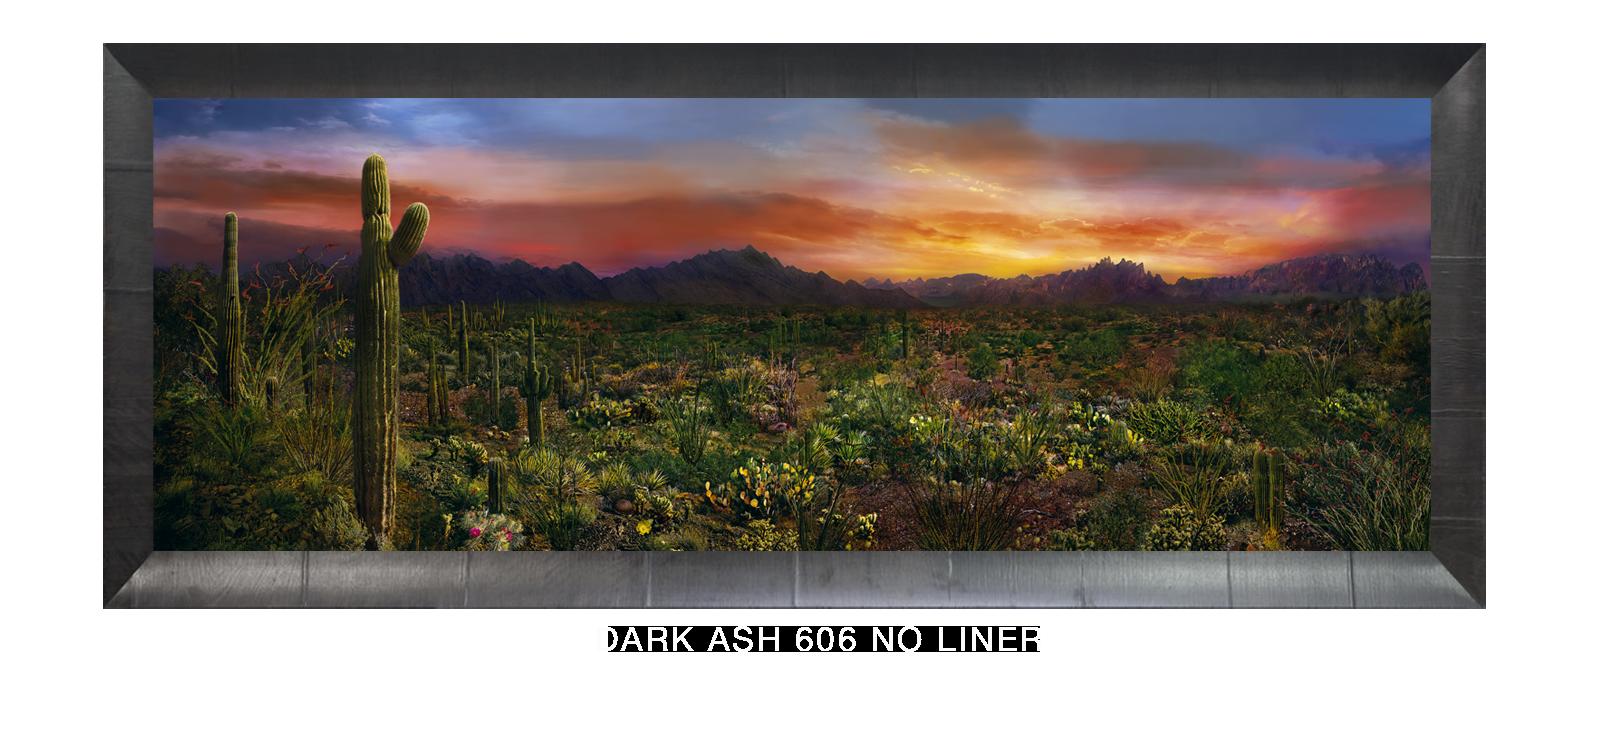 19EDEN VERNALIS Dark Ash 606 w_No Liner T